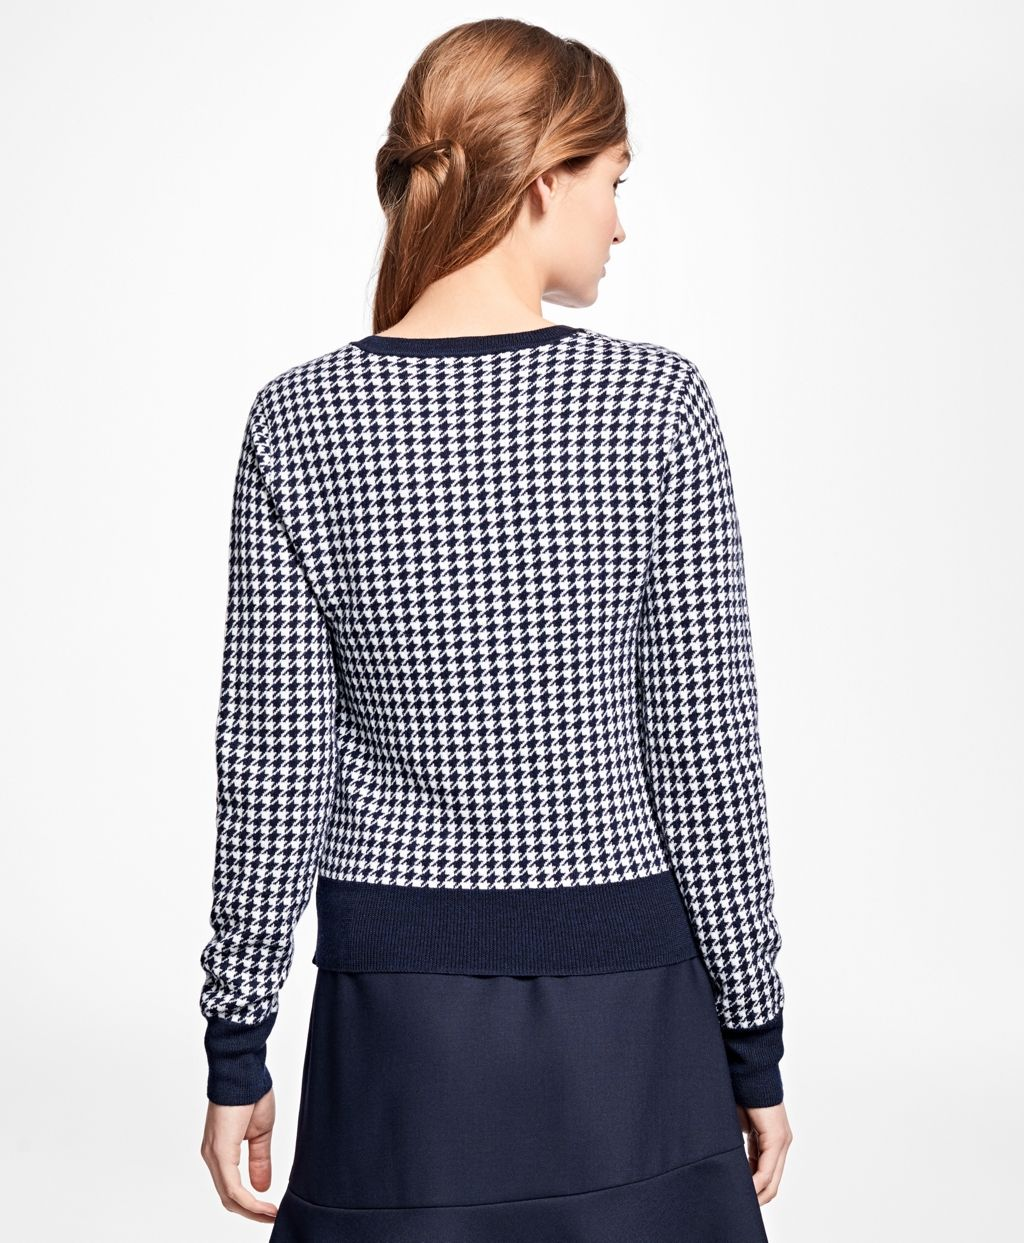 Merino Wool Houndstooth Sweater - Brooks Brothers